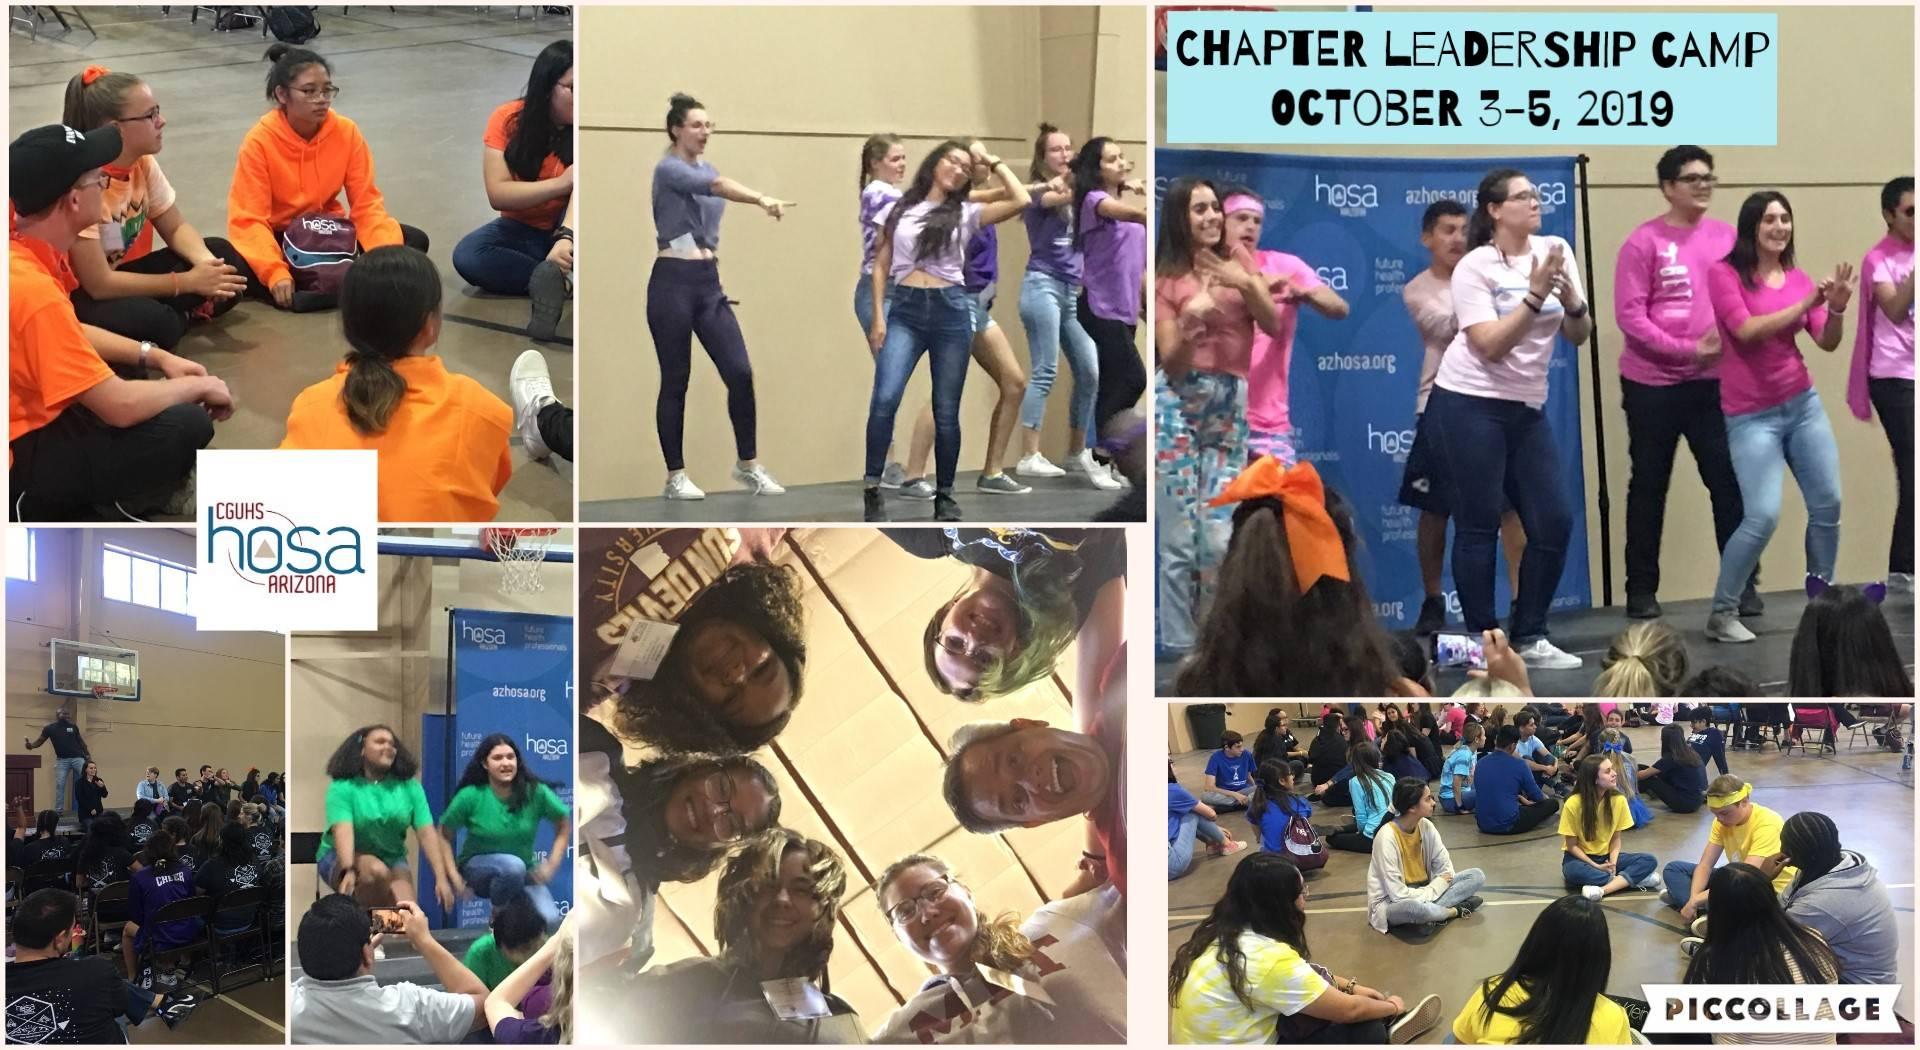 Leadership Camp 2